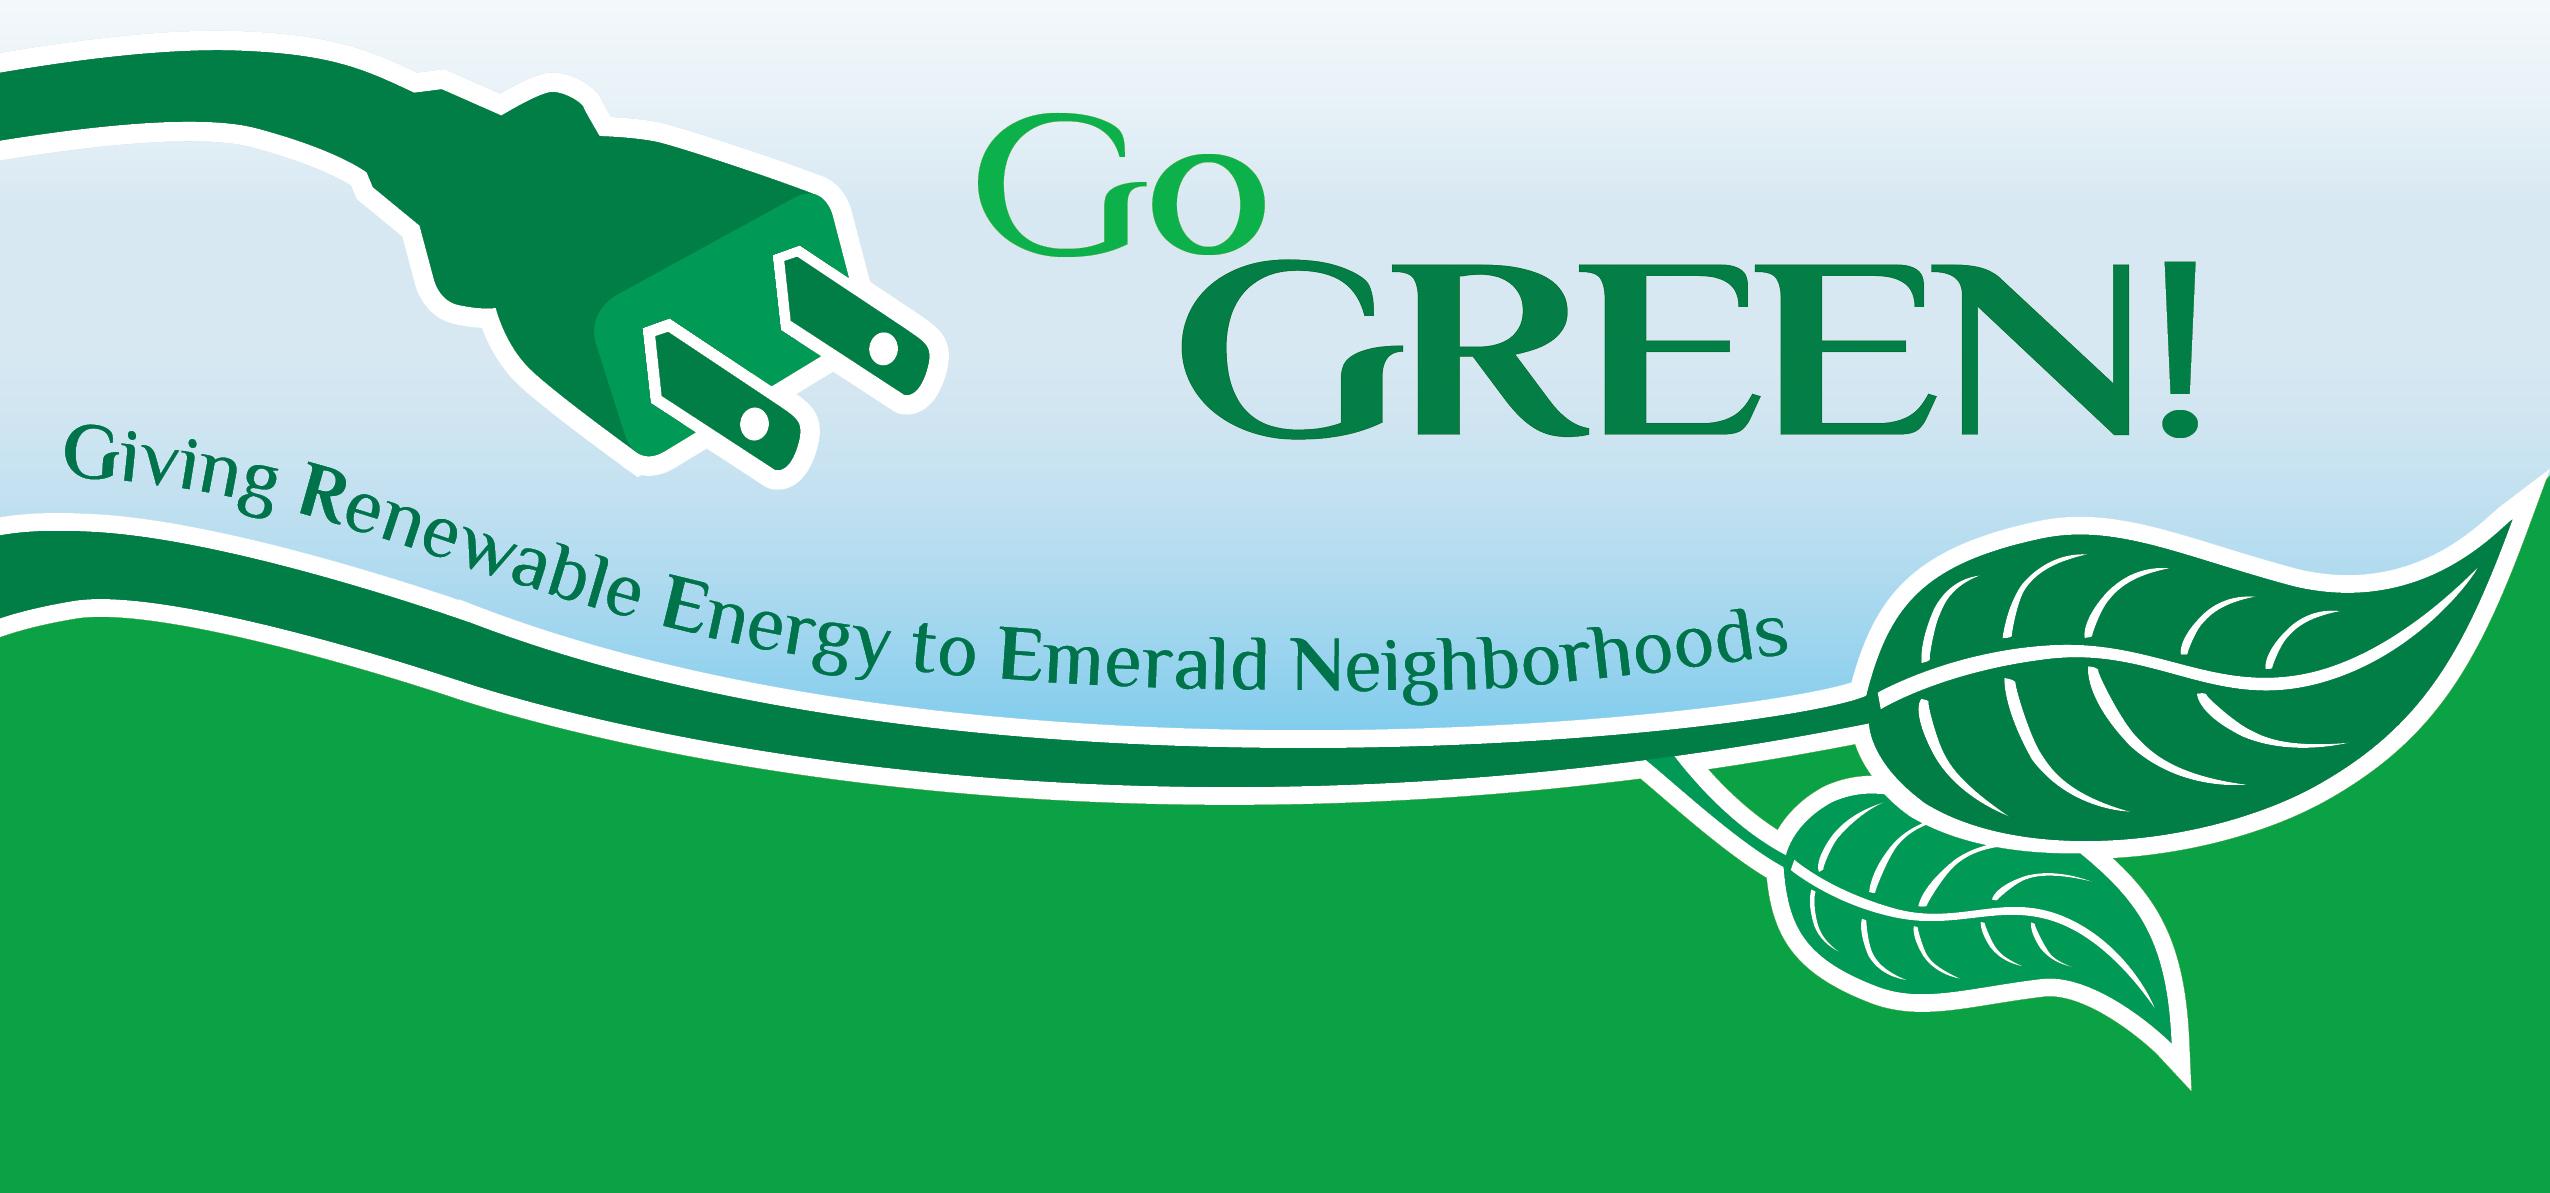 Go Green Help Bring Renewable Energy To Emerald